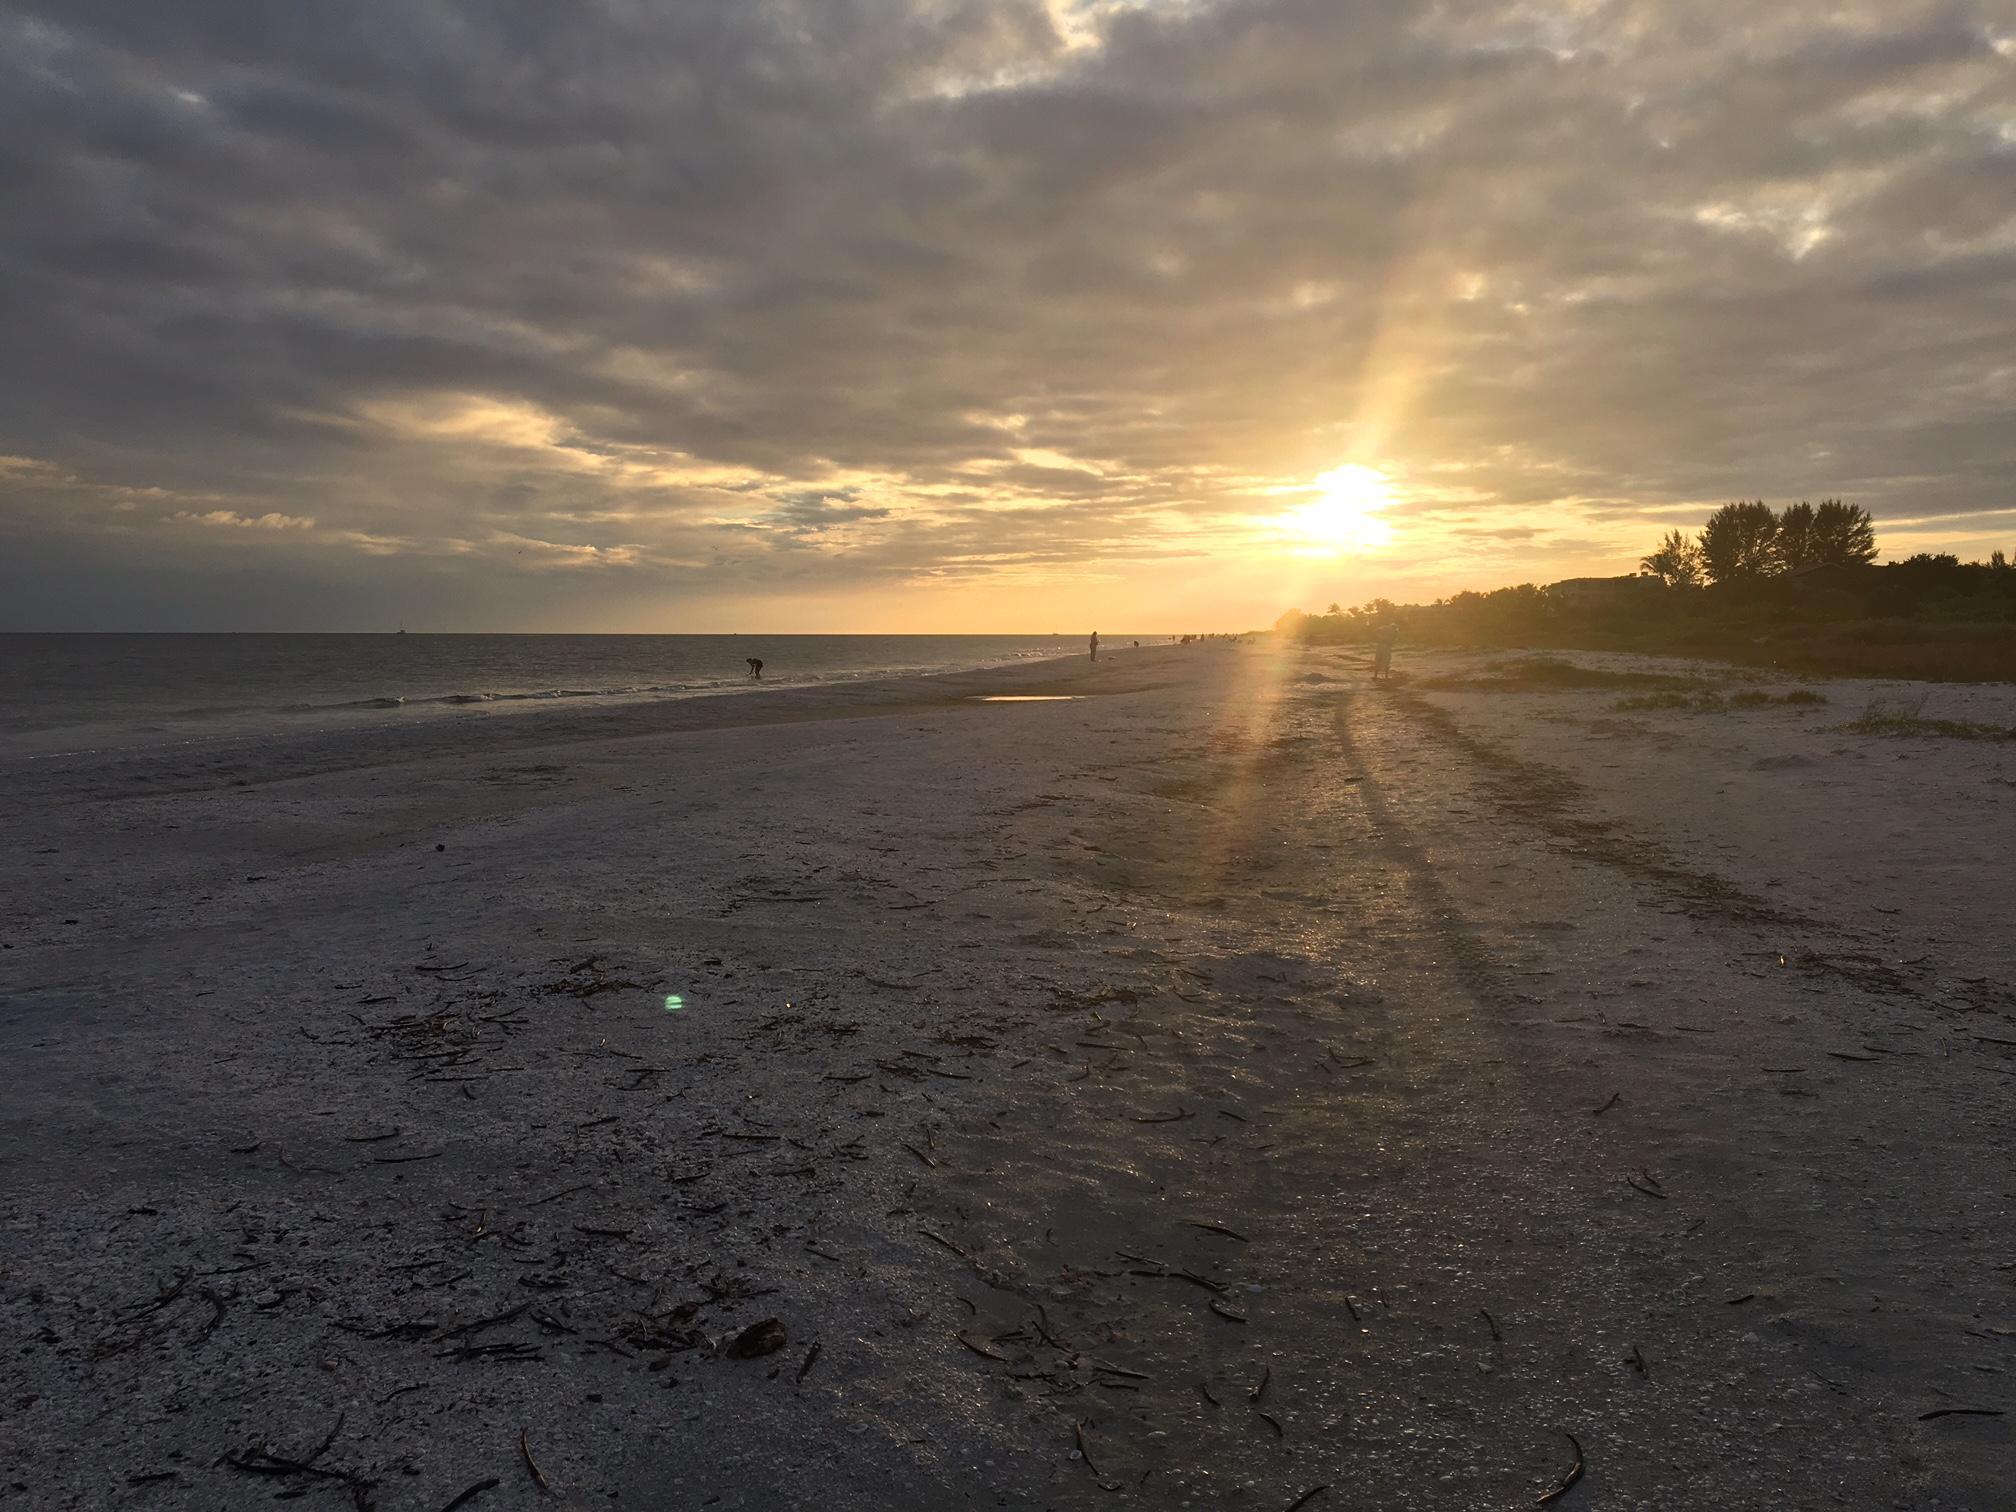 Testimonials - Seahorse Cottage of Sanibel Florida